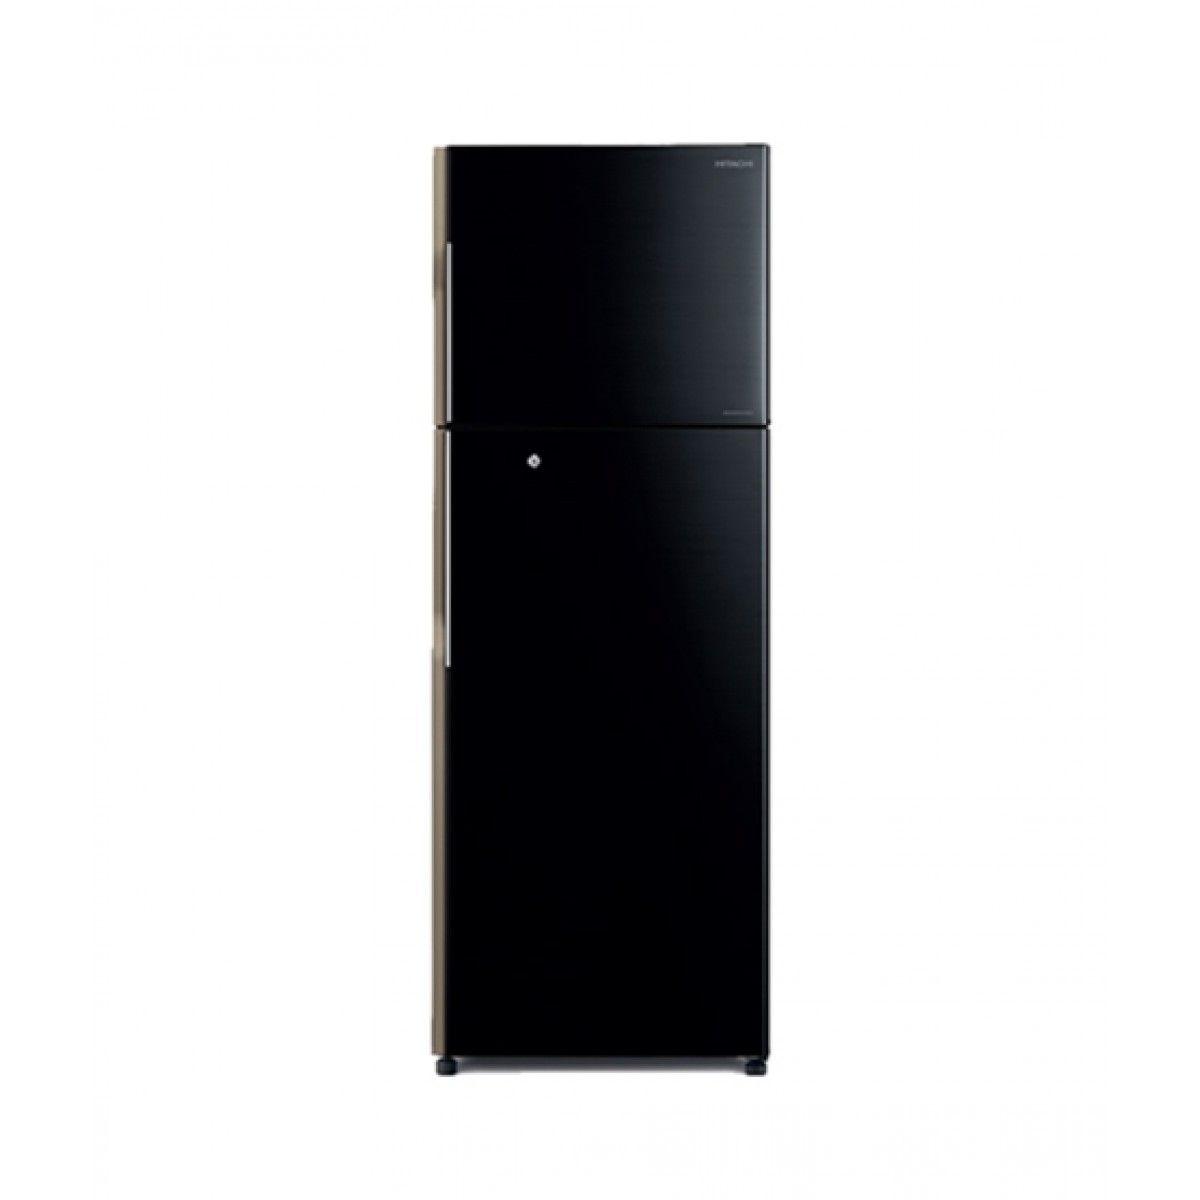 Hitachi (R-H270P4PBK) Freezer-on-Top 10 cu ft Refrigerator